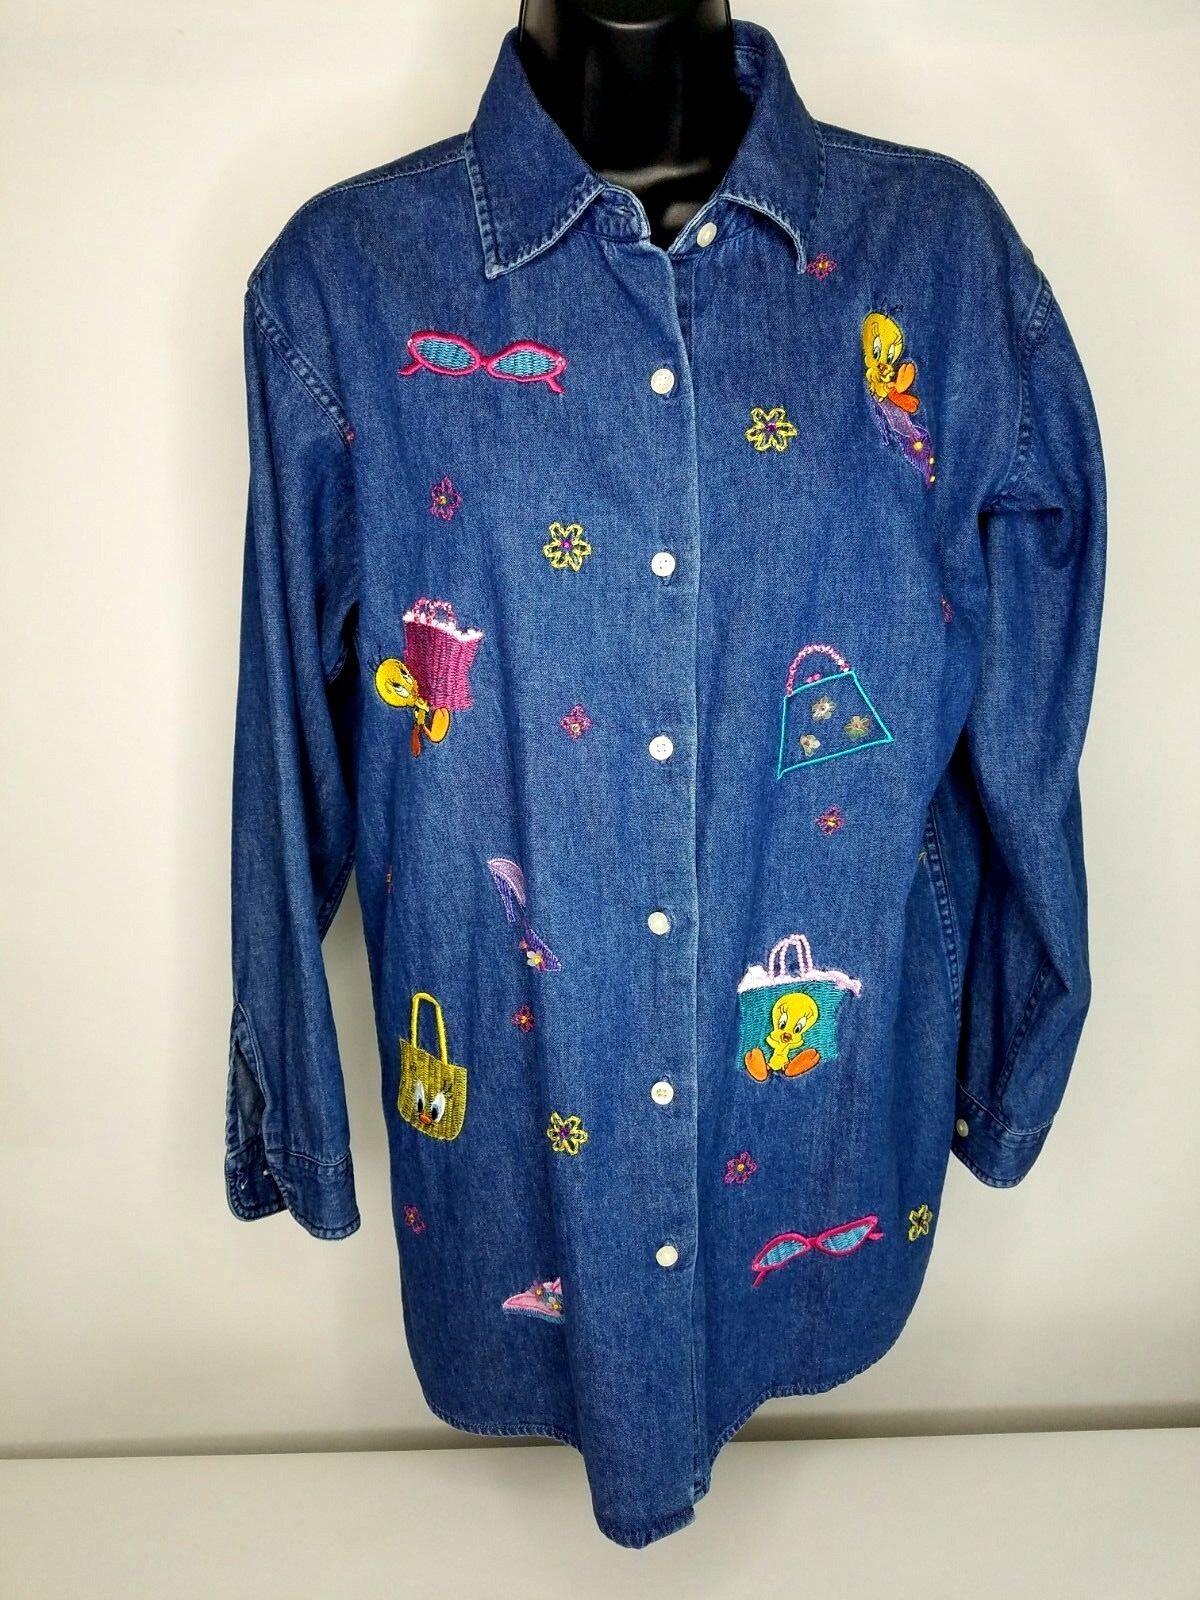 Warner Bros Women Top bluee Denim Shirt Tweety Embroidered Looney Tunes Small